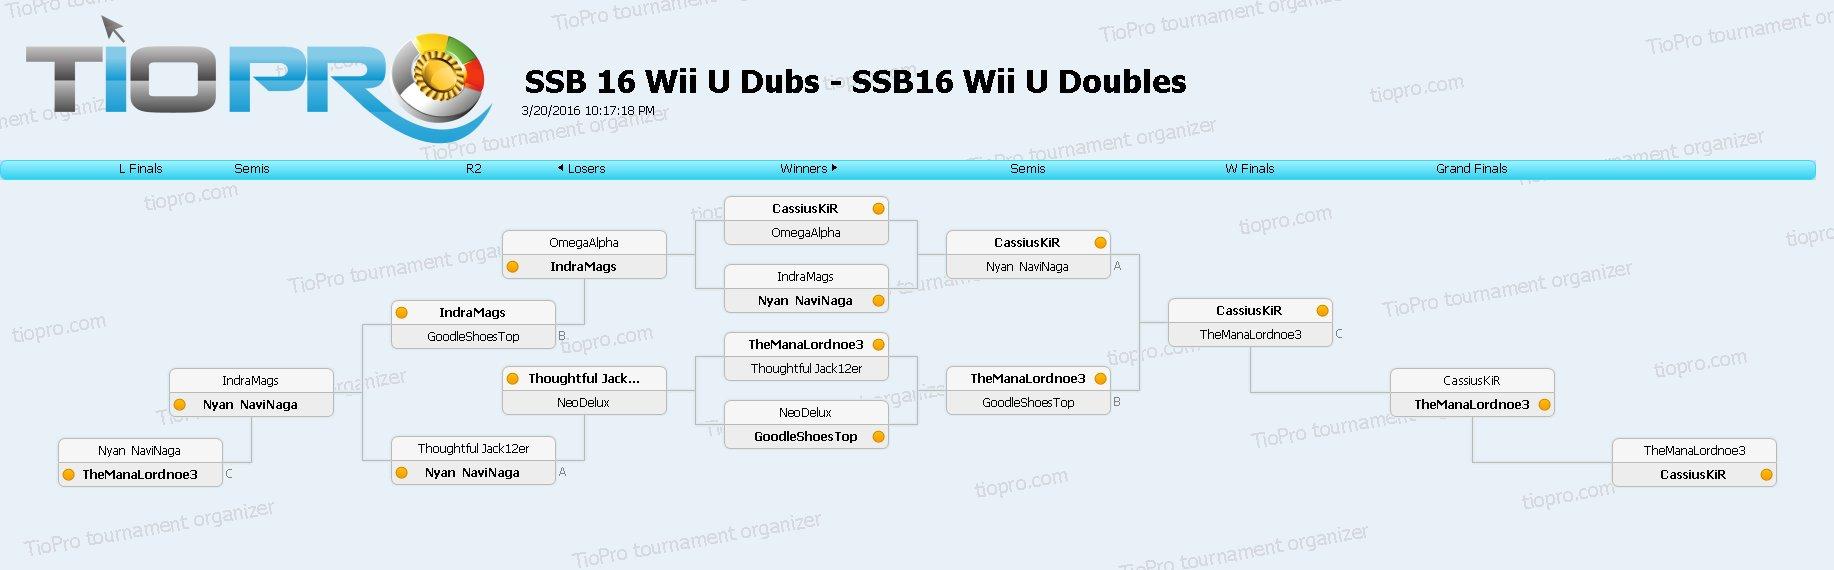 SSB16 Wii U Doubles